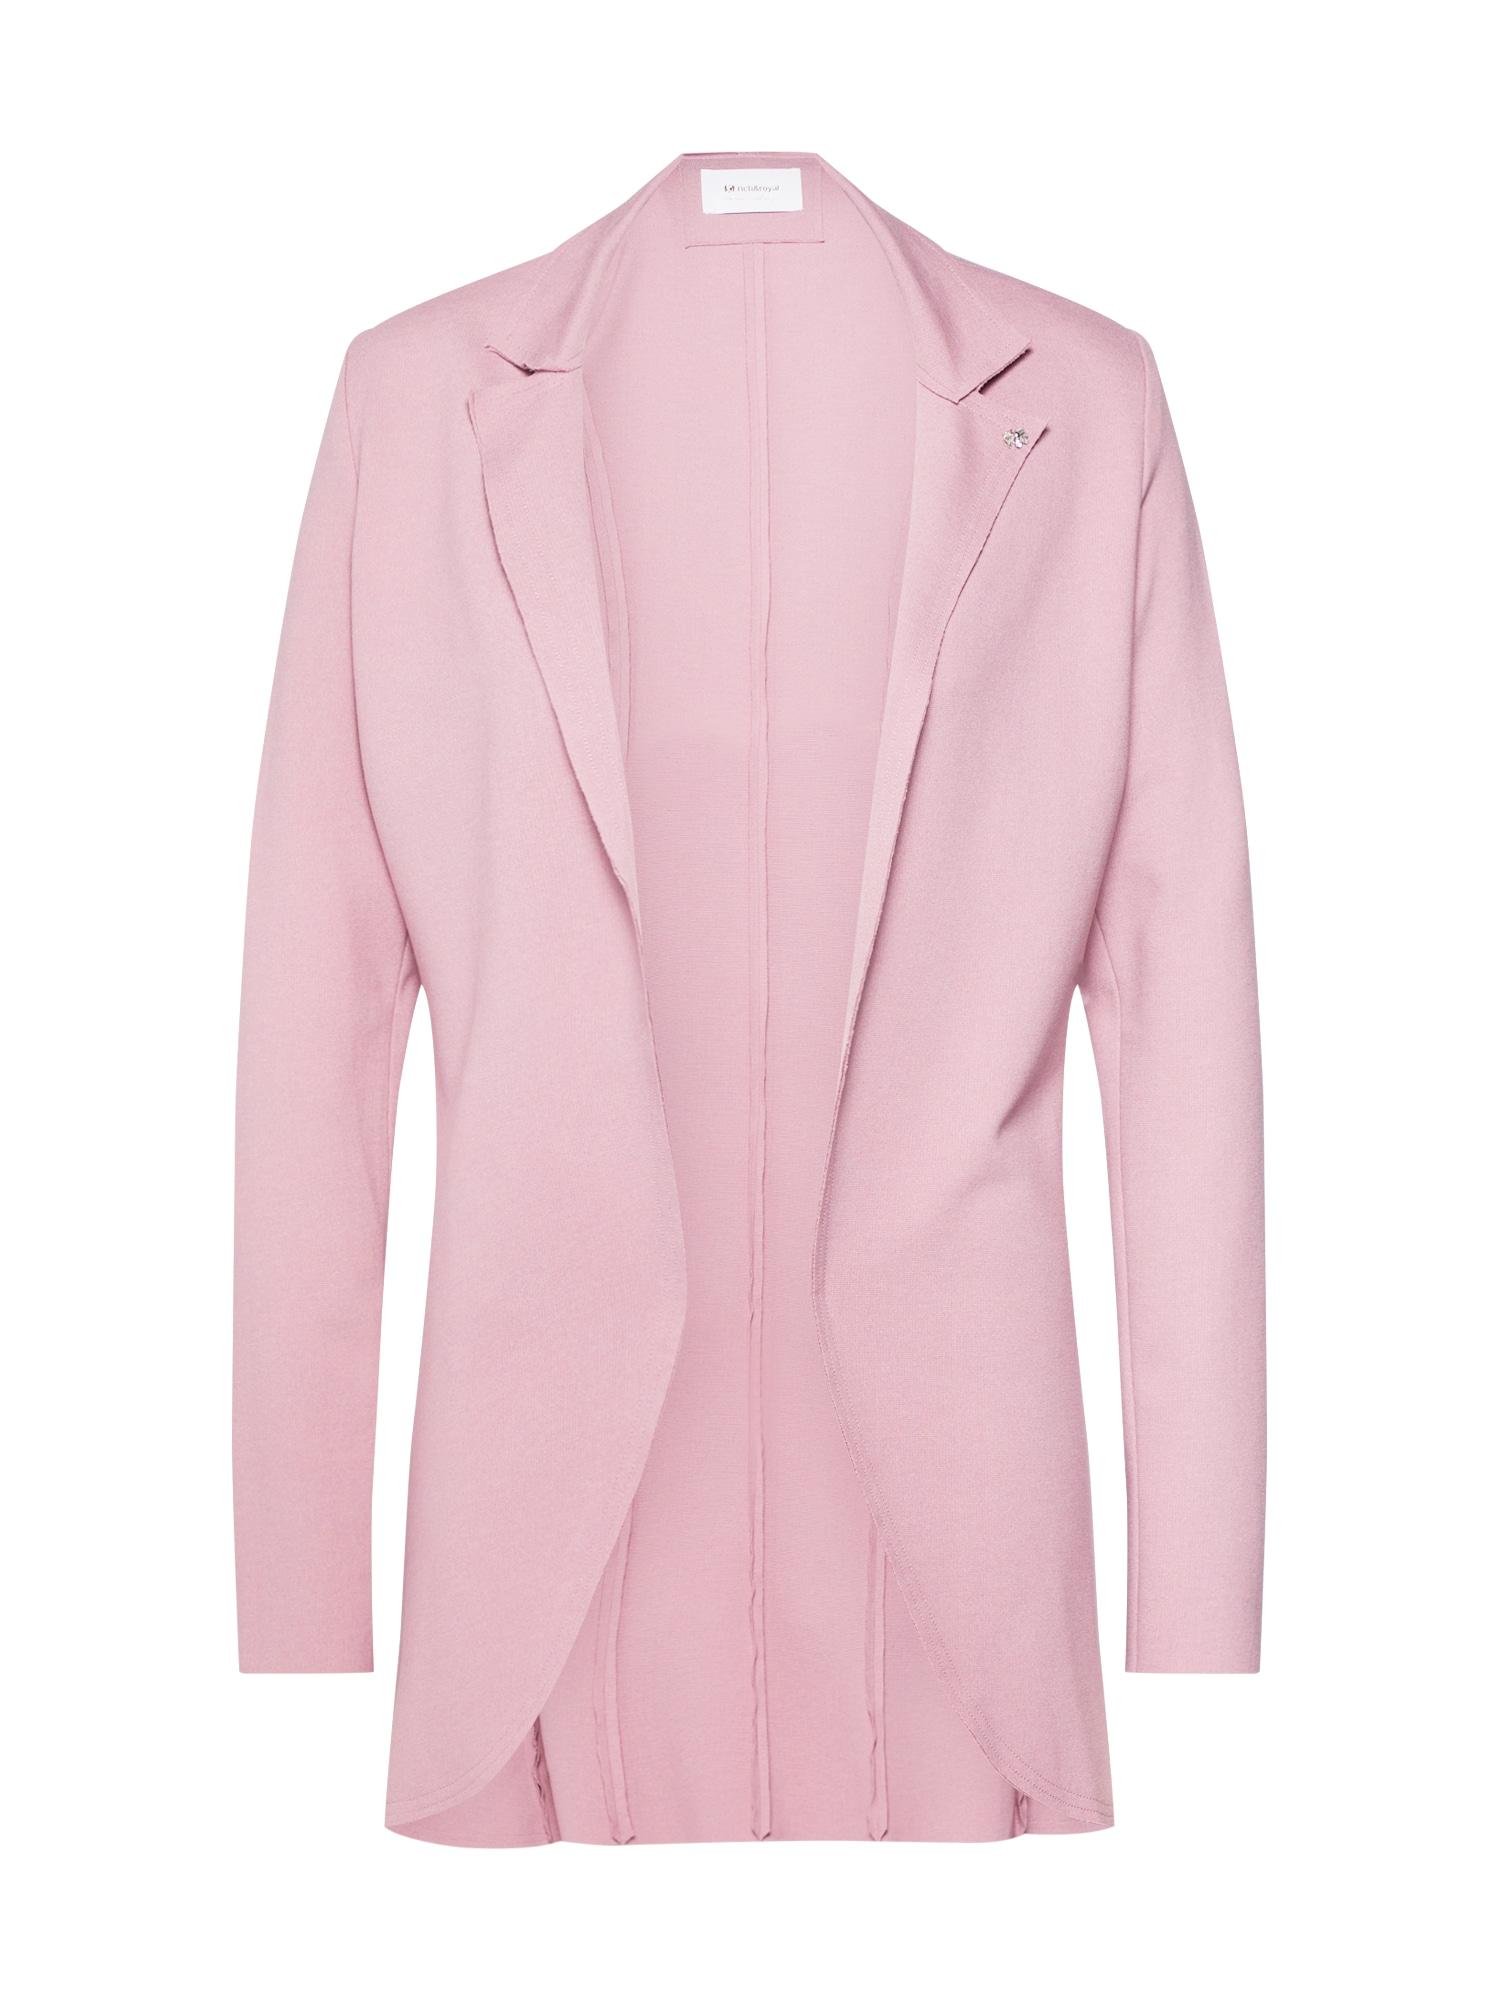 Sweat Blazer   Bekleidung > Blazer > Sweatblazer   Rich & Royal